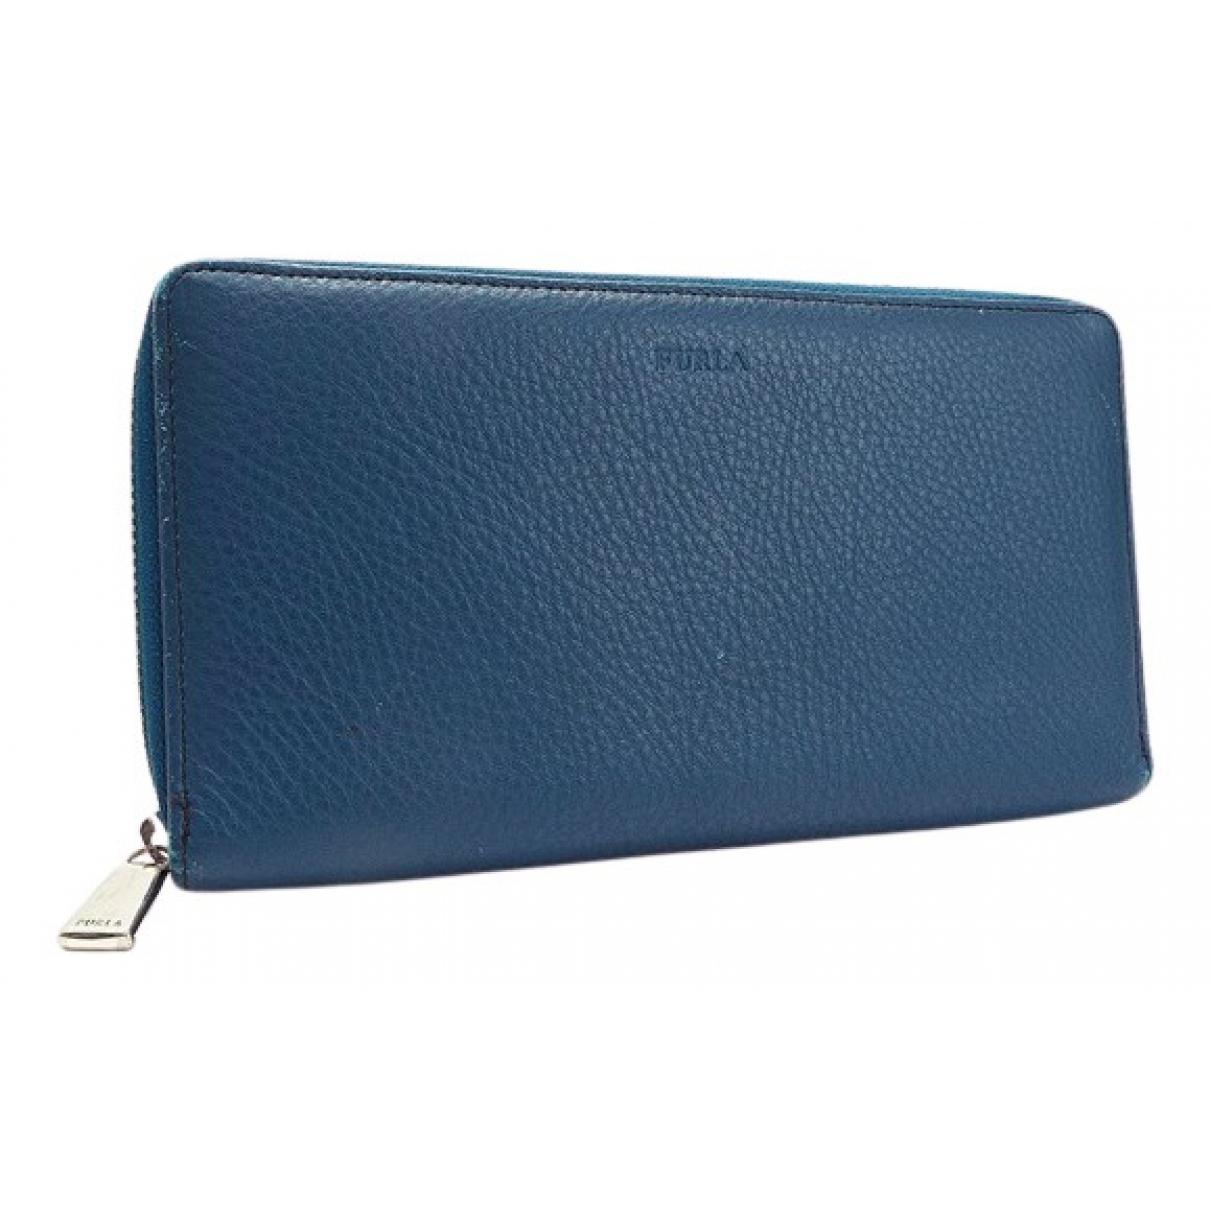 Furla N Blue Leather Small bag, wallet & cases for Men N